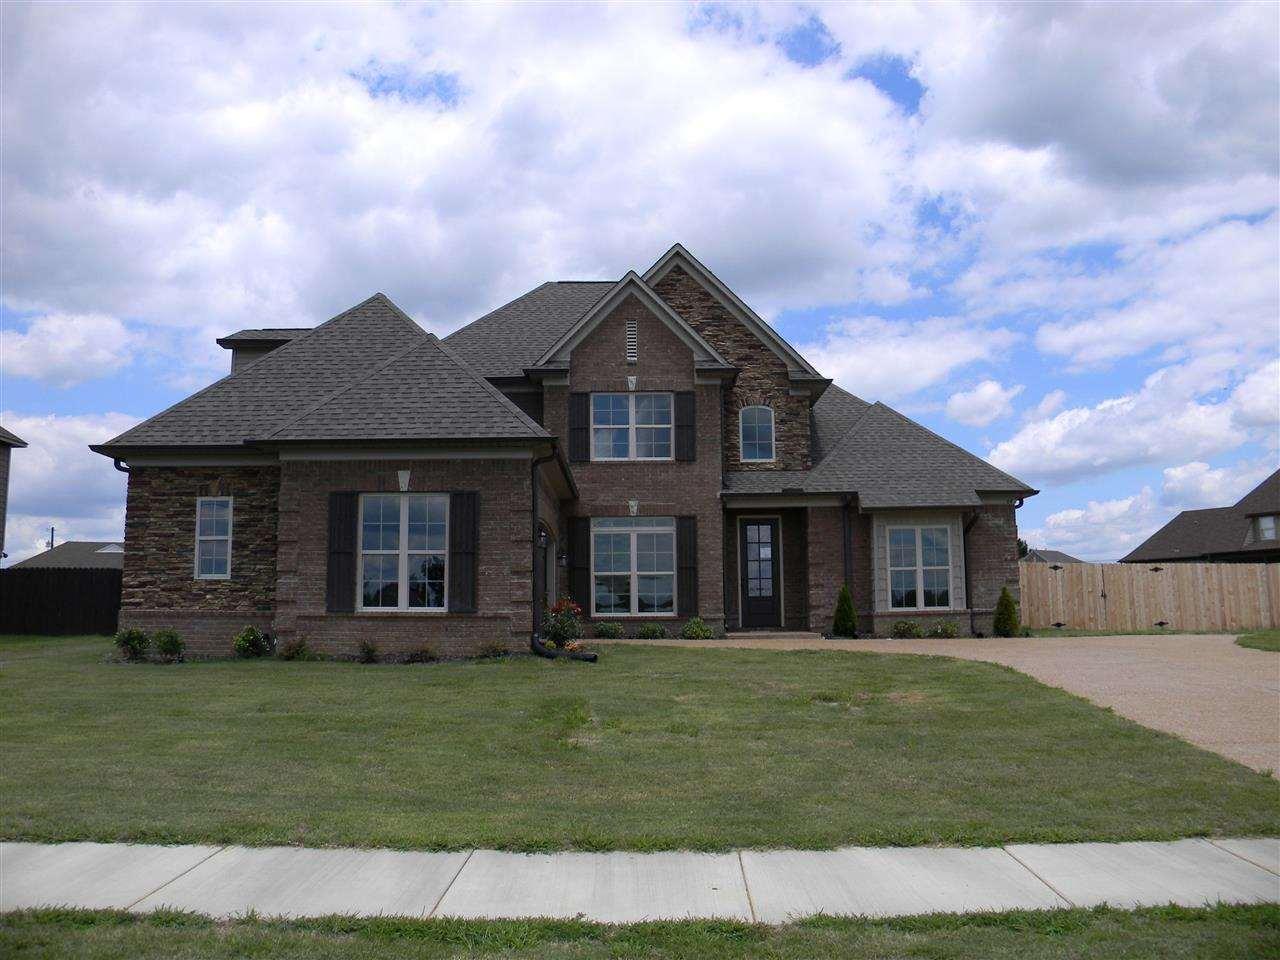 D d custom homes llc developments in memphis newhomes for Modern homes llc